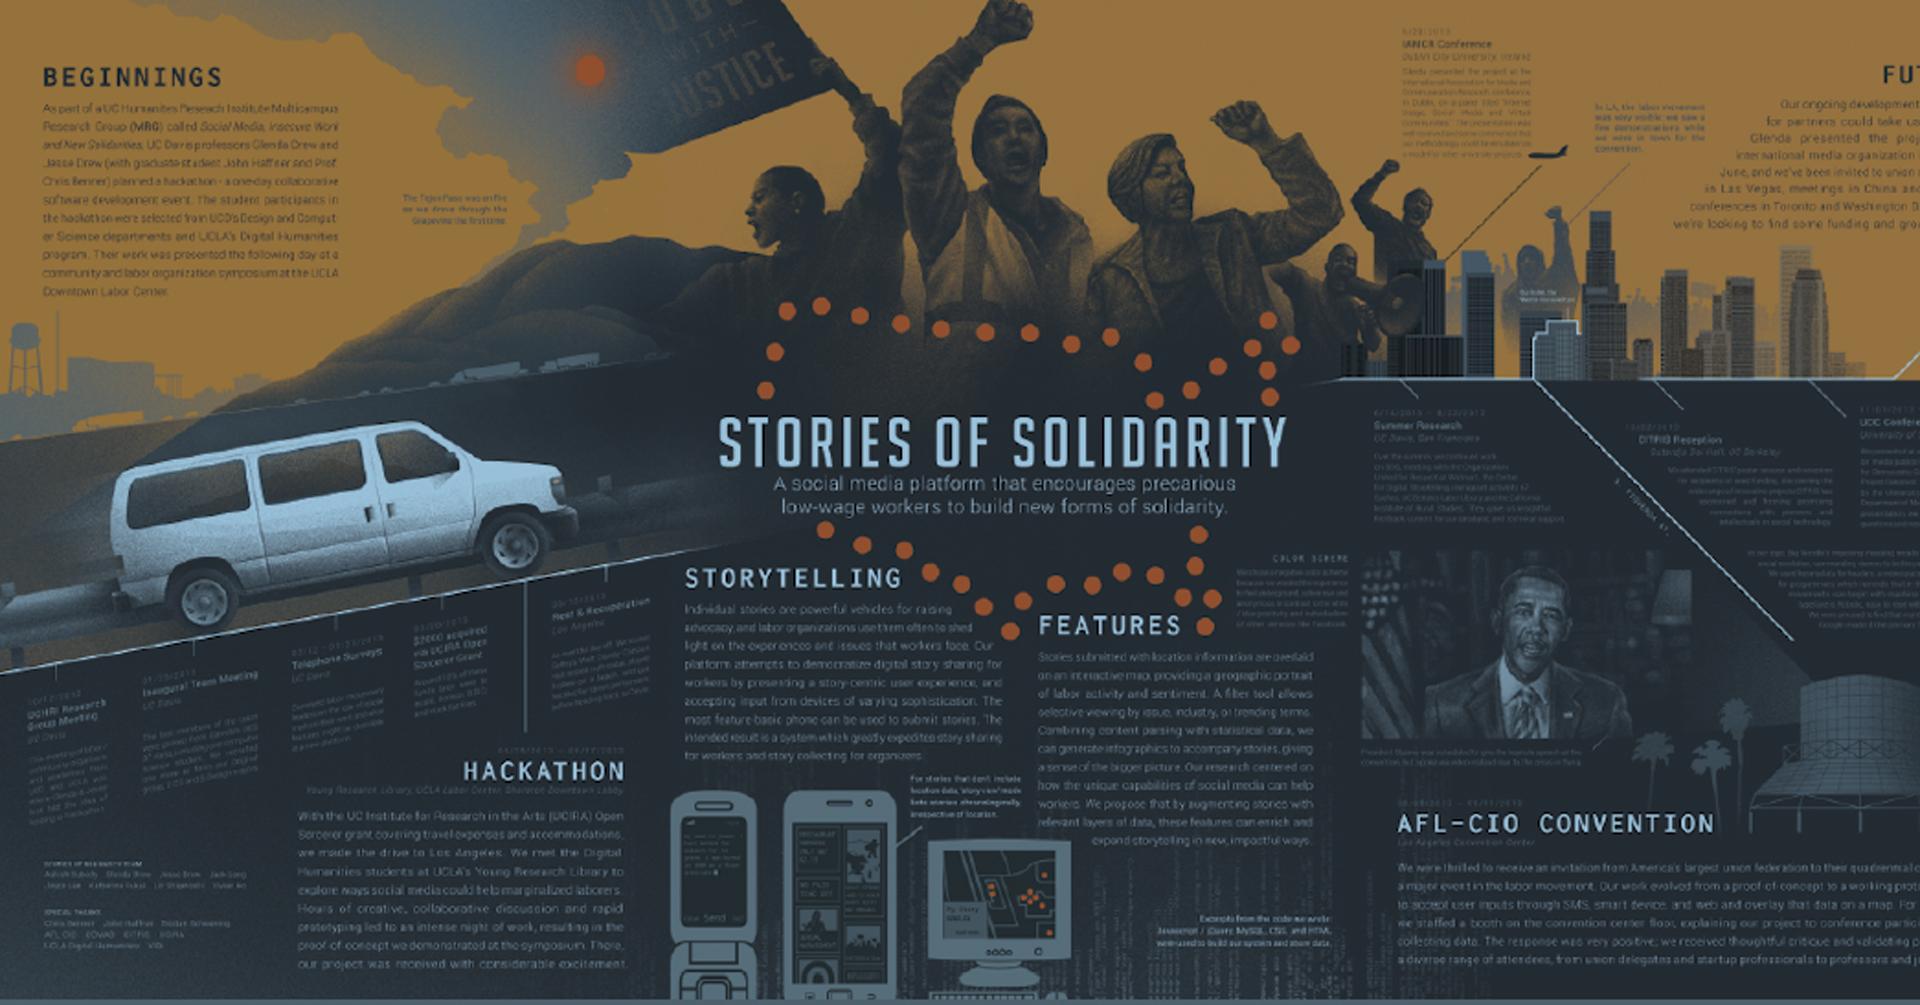 ©ISEA2016: 22nd International Symposium on Electronic Art, Glenda Drew, Jesse Drew, and Jack Leng, Stories of Solidarity